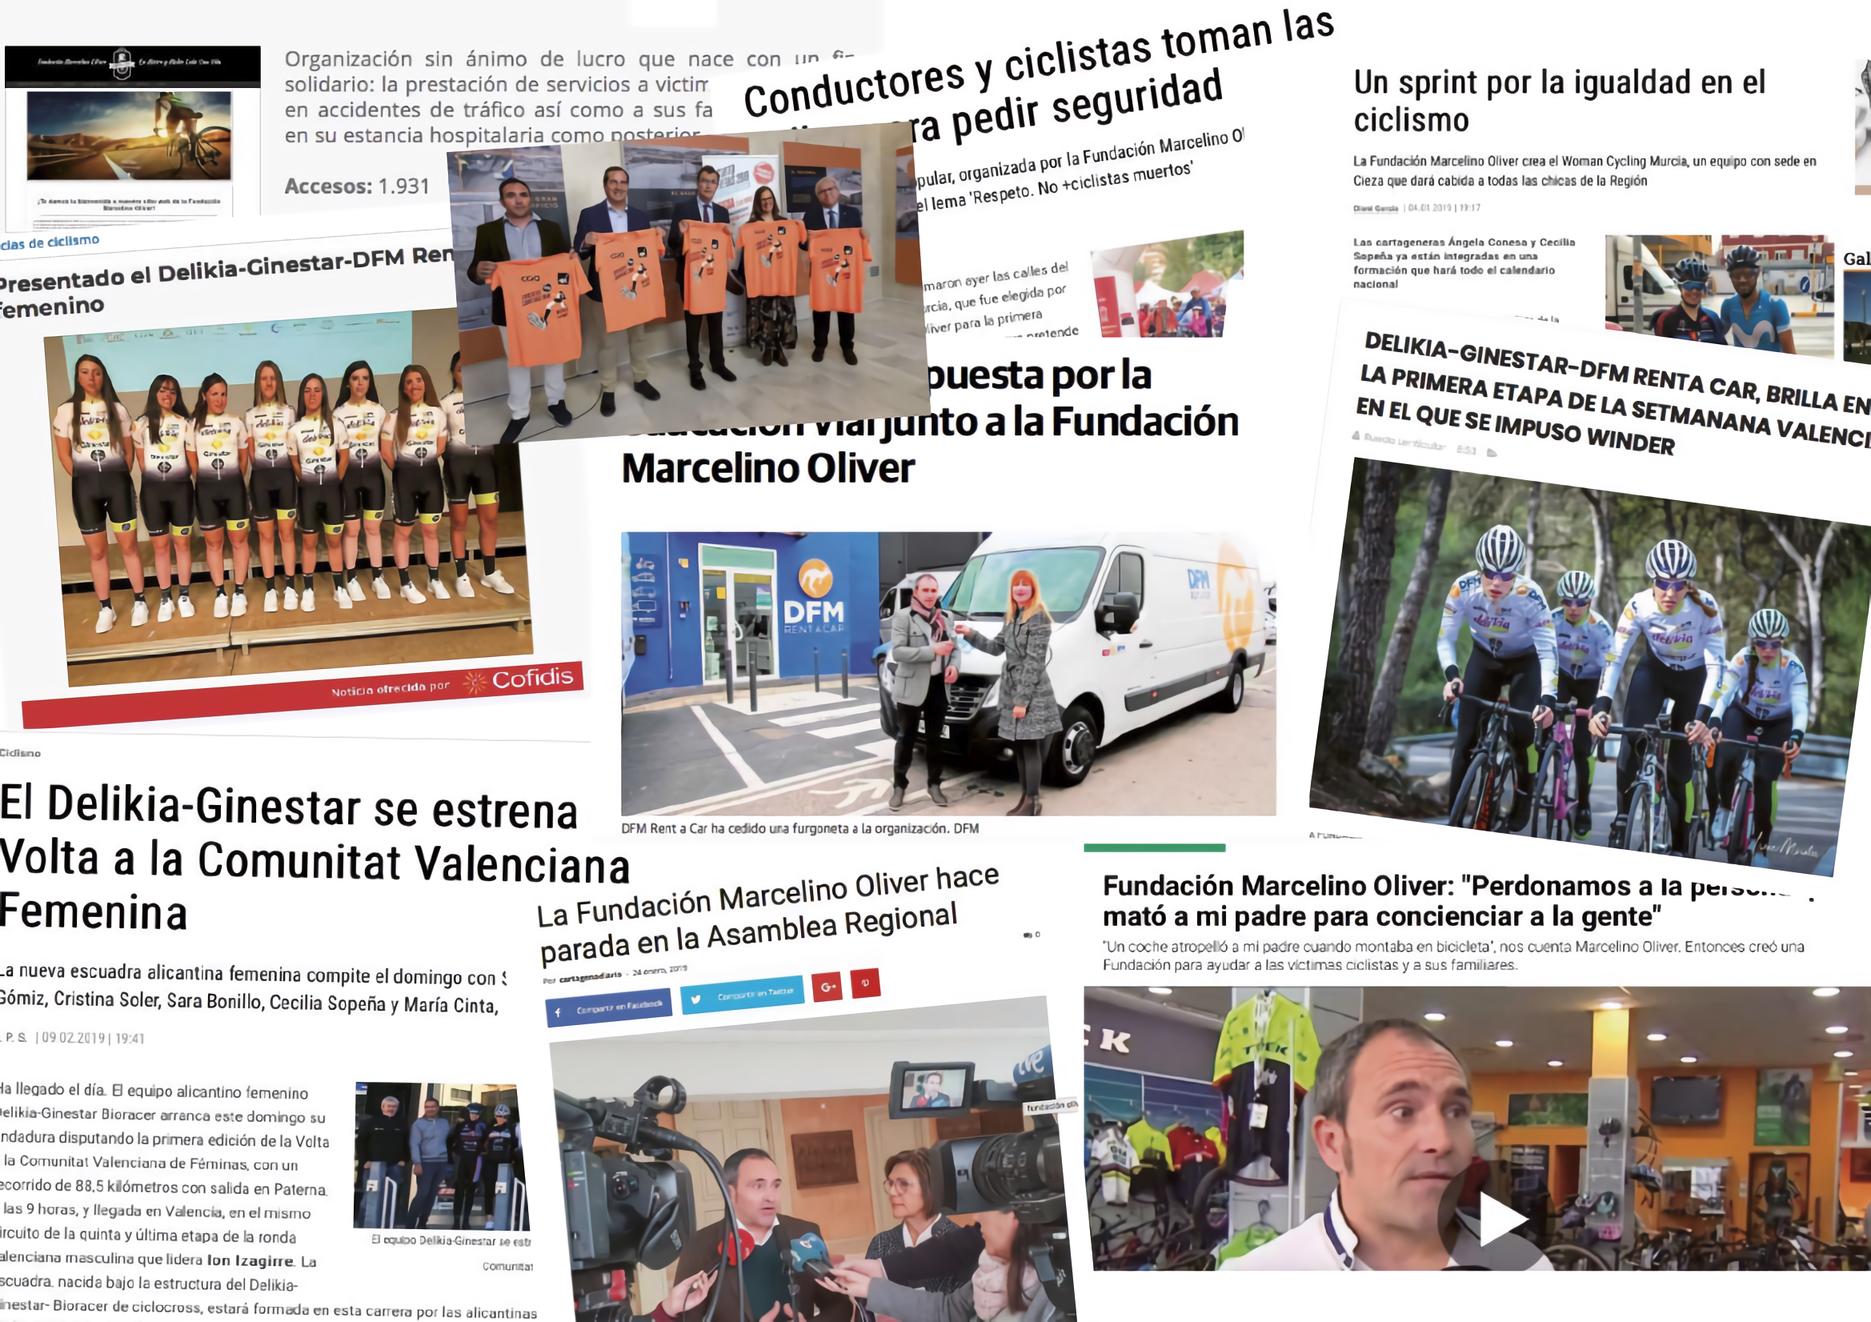 fondo10d transparente fundacion marcelino oliver fundacionmarcelinooliver.org